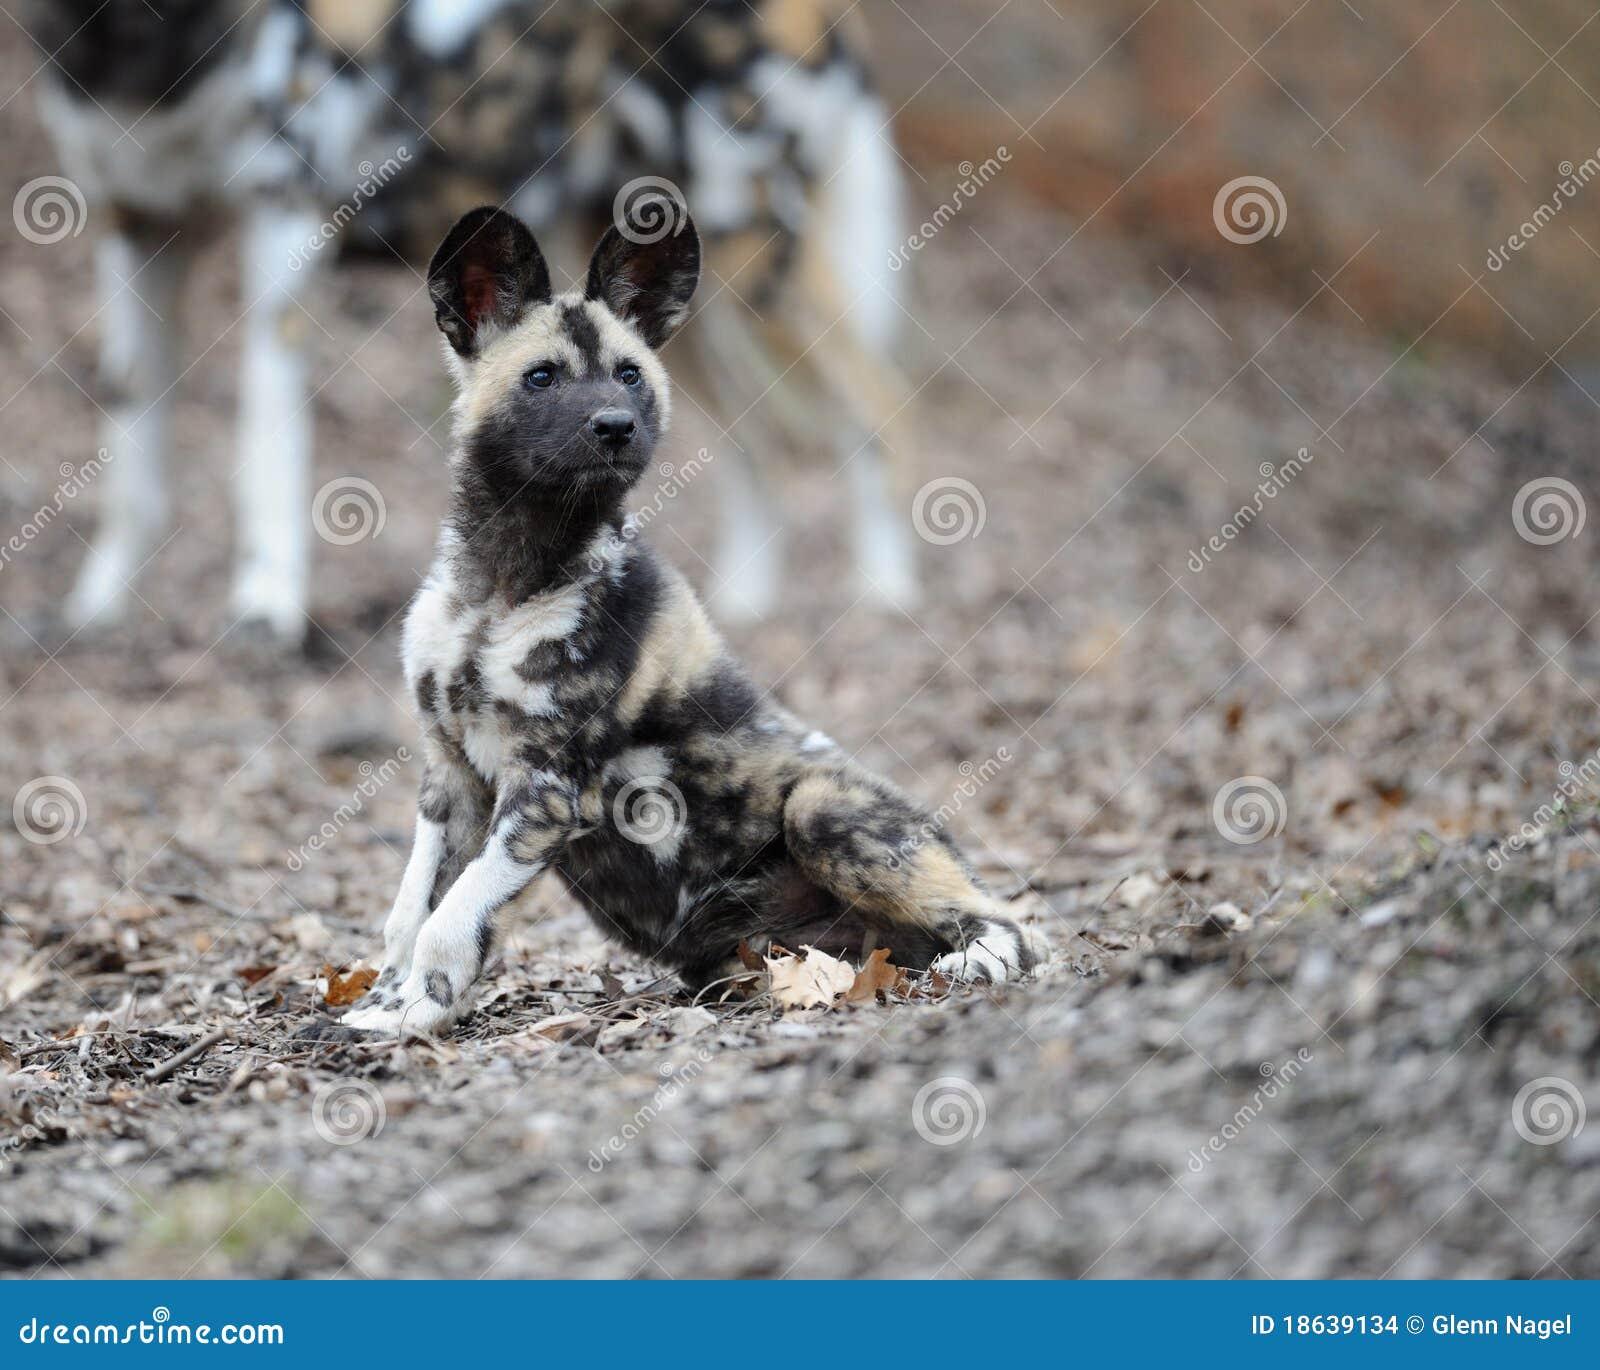 the african wild dog pdf